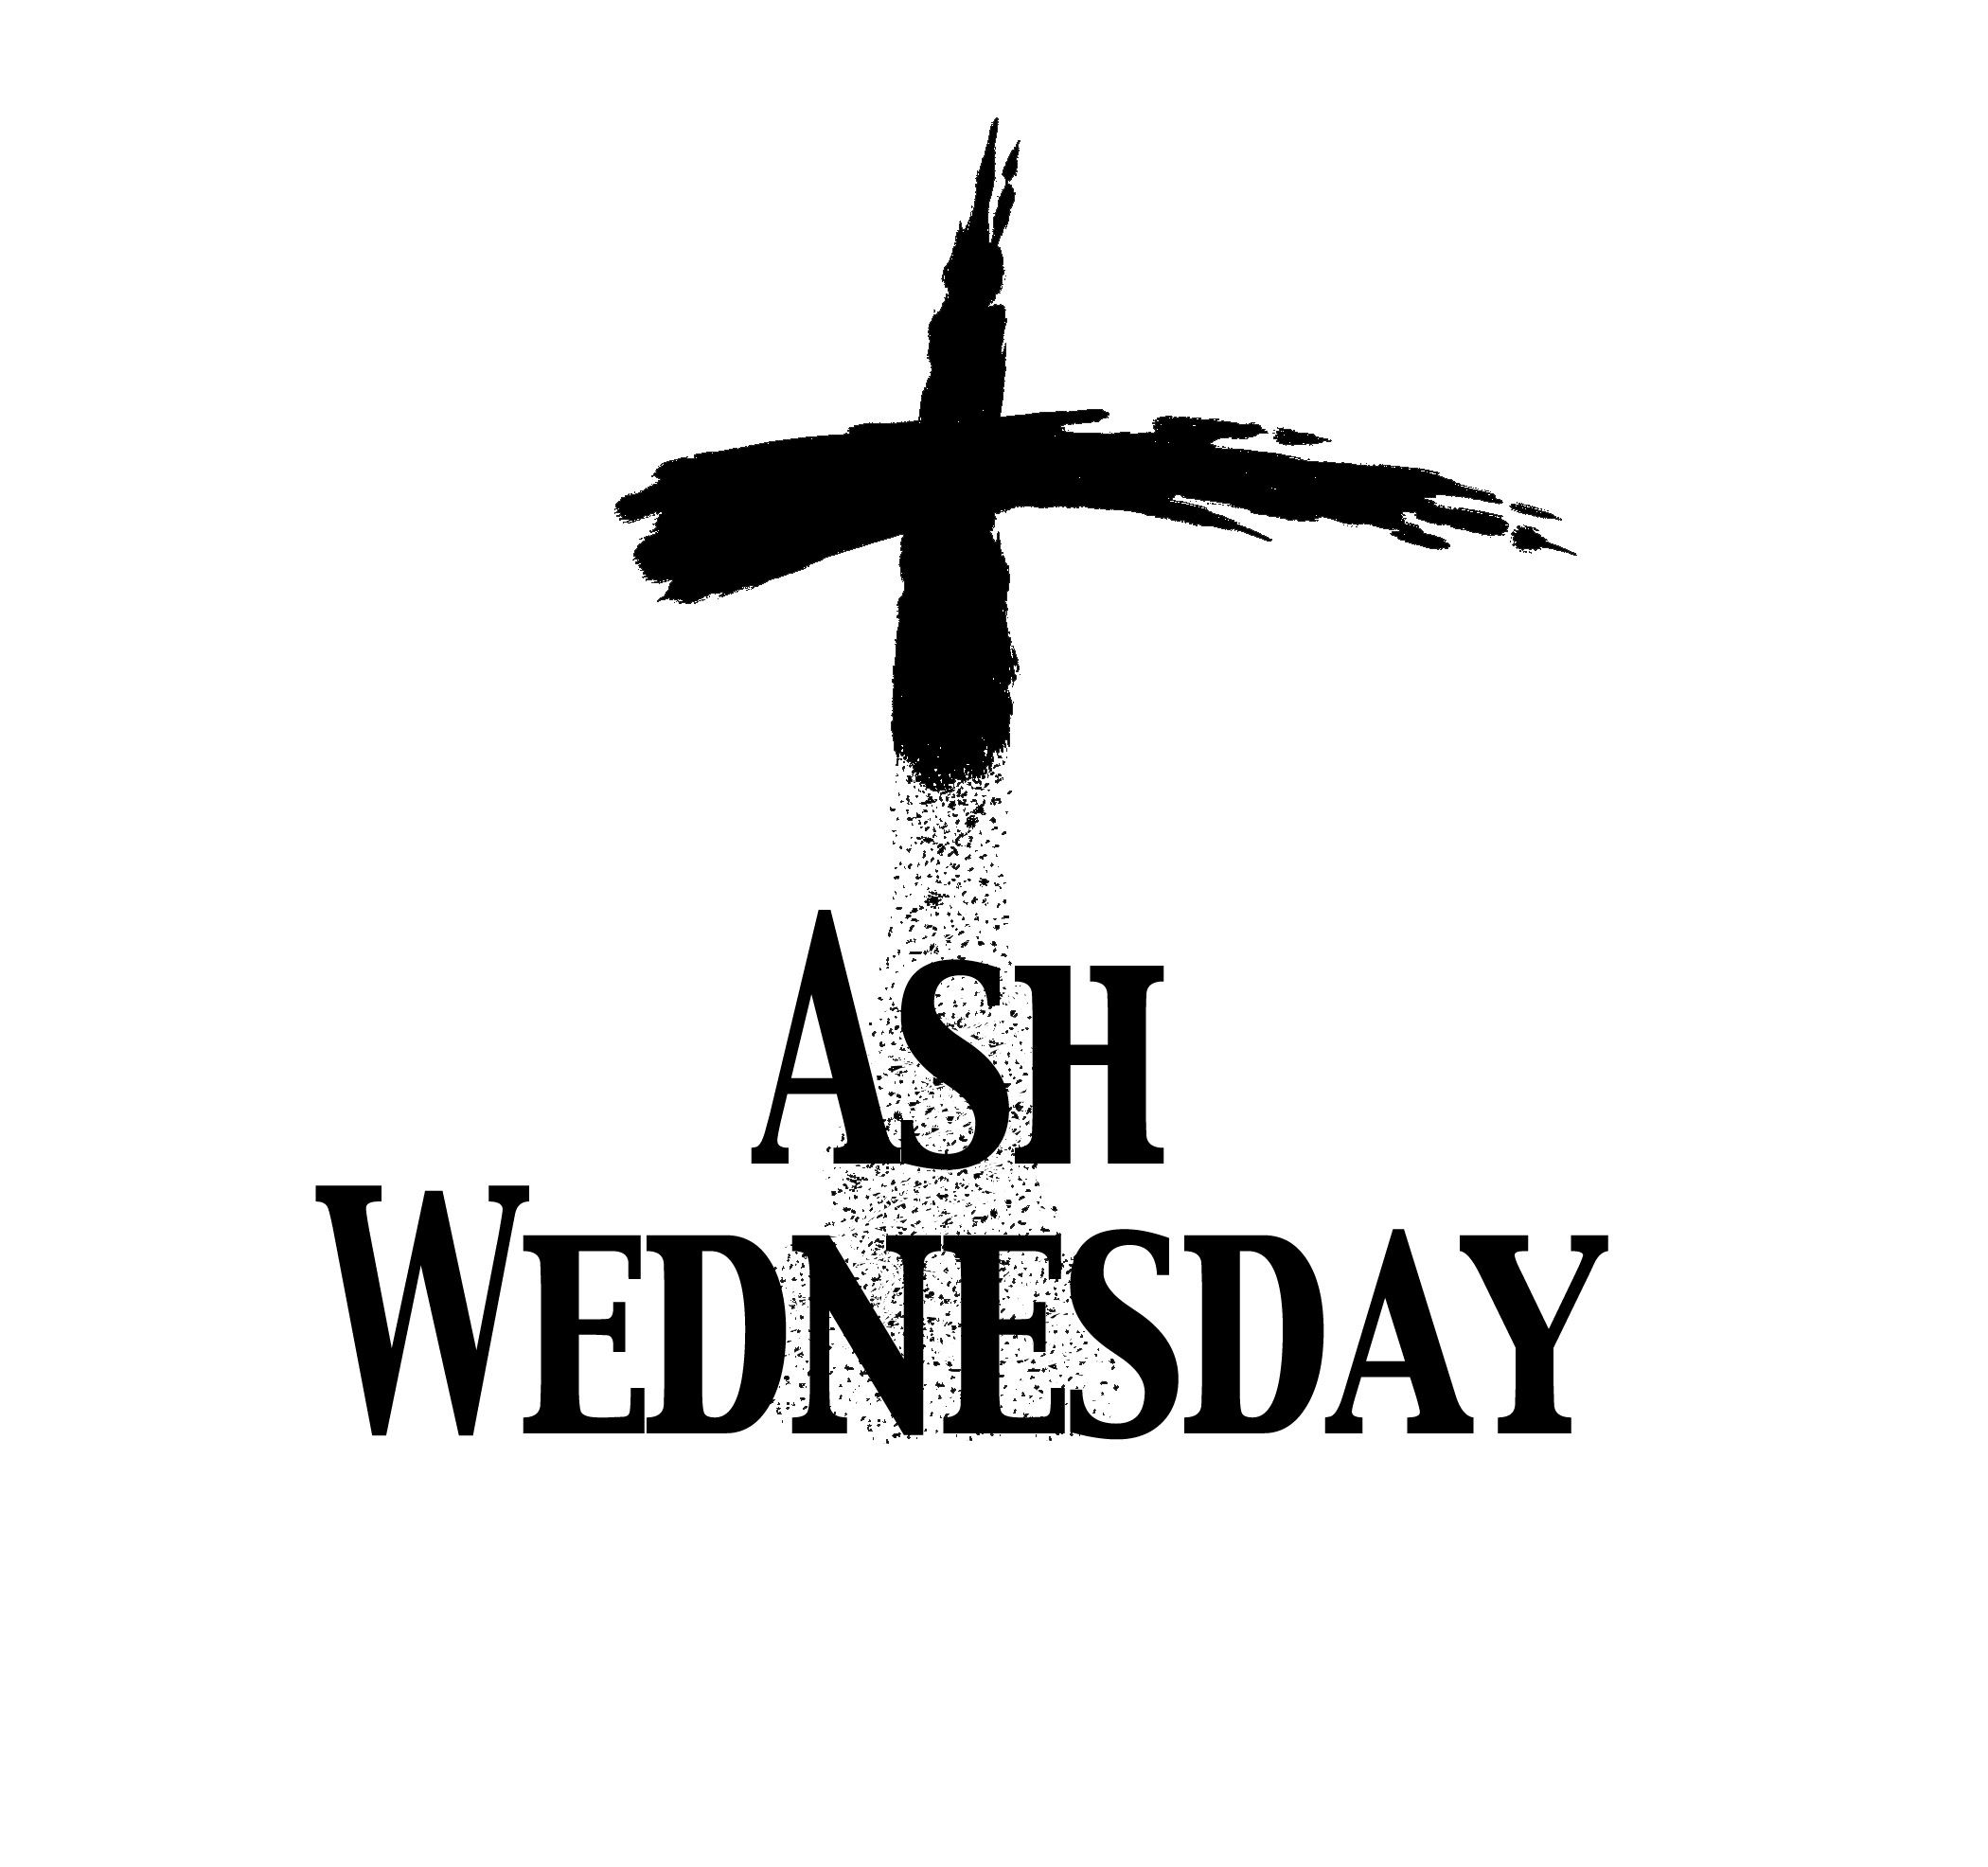 Ash Wednesday Clipart-Ash Wednesday clipart-5